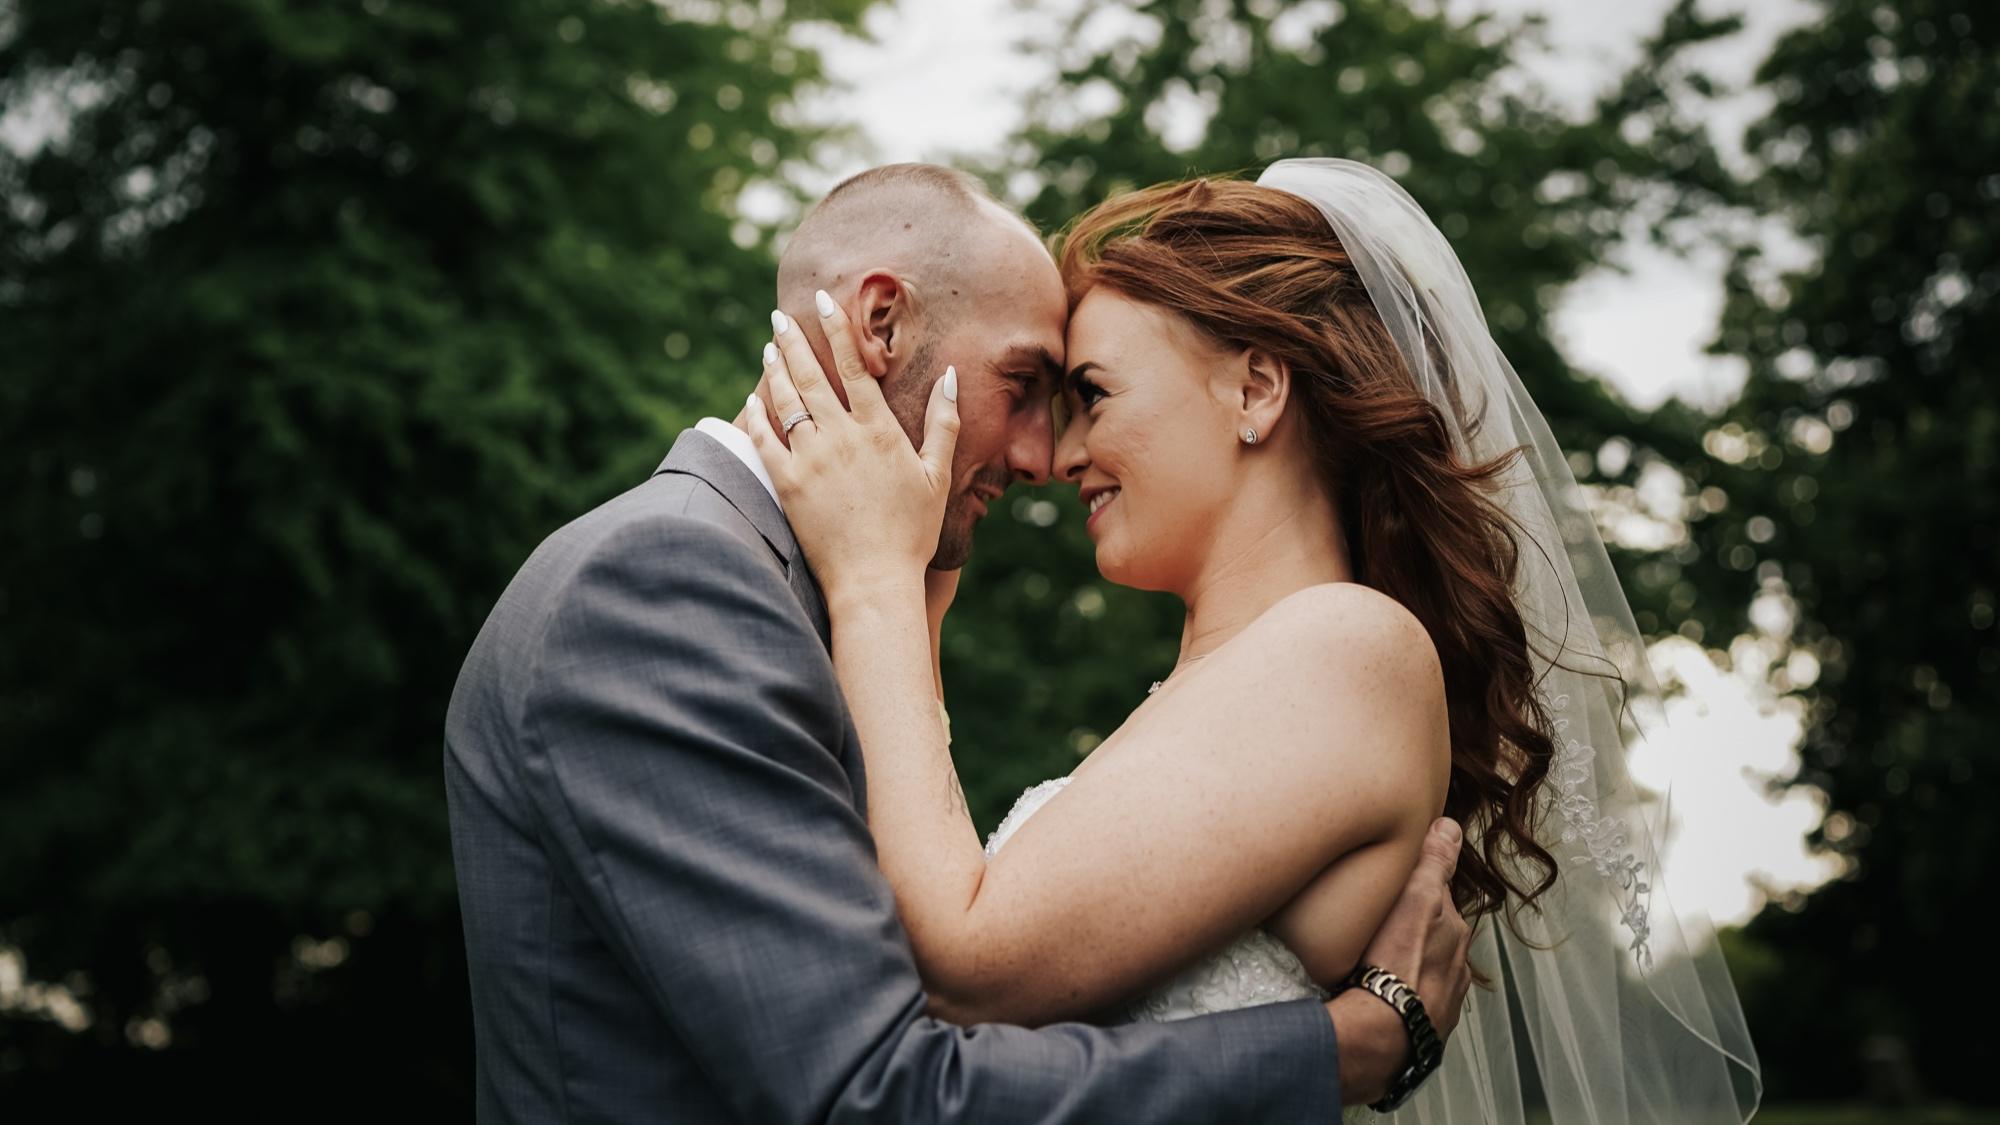 Double+Tree+Chester+Wedding+Photography+lancashire+wedding+photographer+%286+of+10%29.jpg